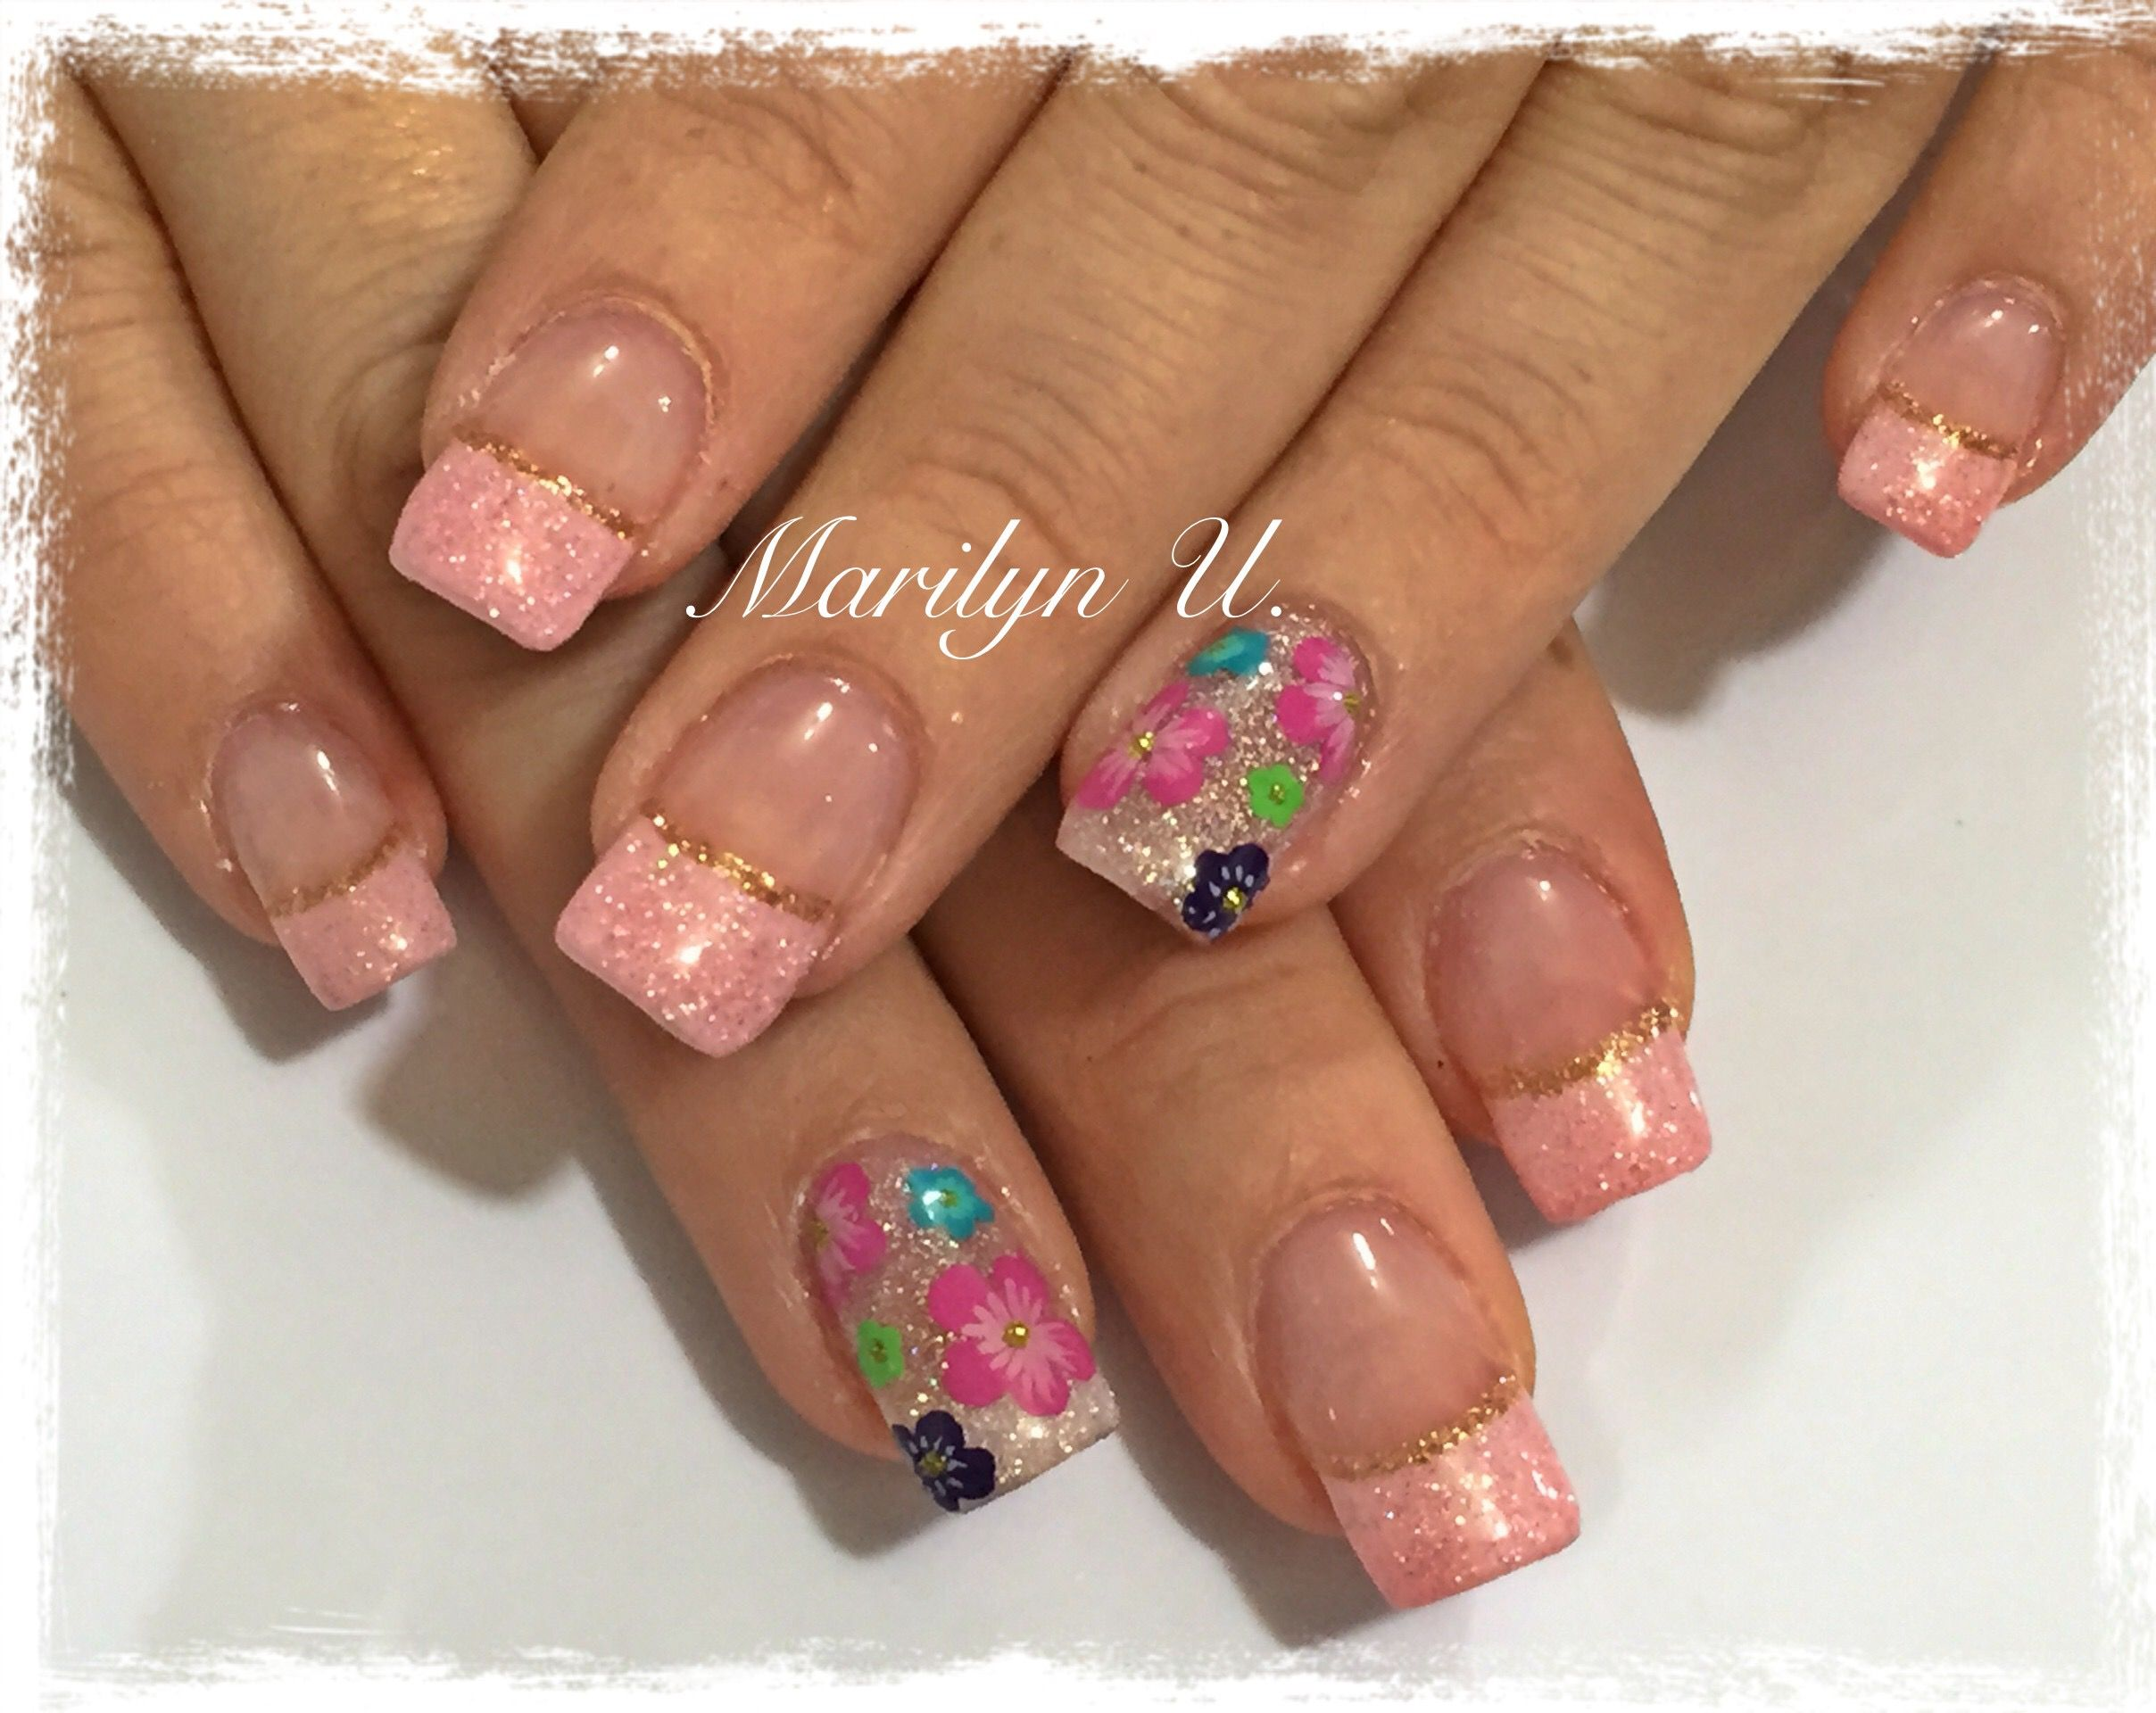 Pin by Marilyn Ugalde on Especialidad en uñas Marilyn | Pinterest ...